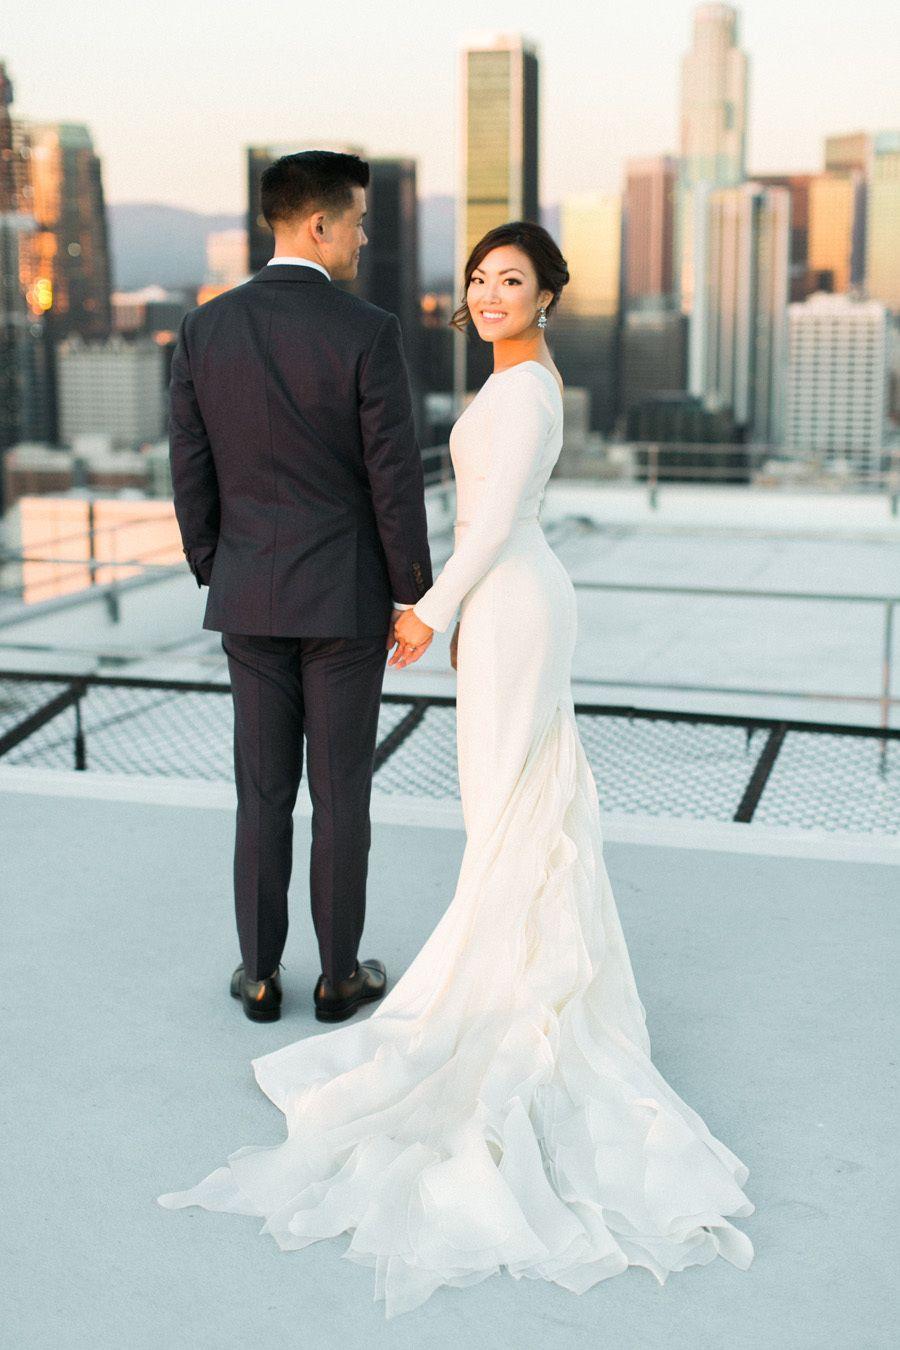 Sleek Modern Wedding Dresses that are Redefining Classic Someday